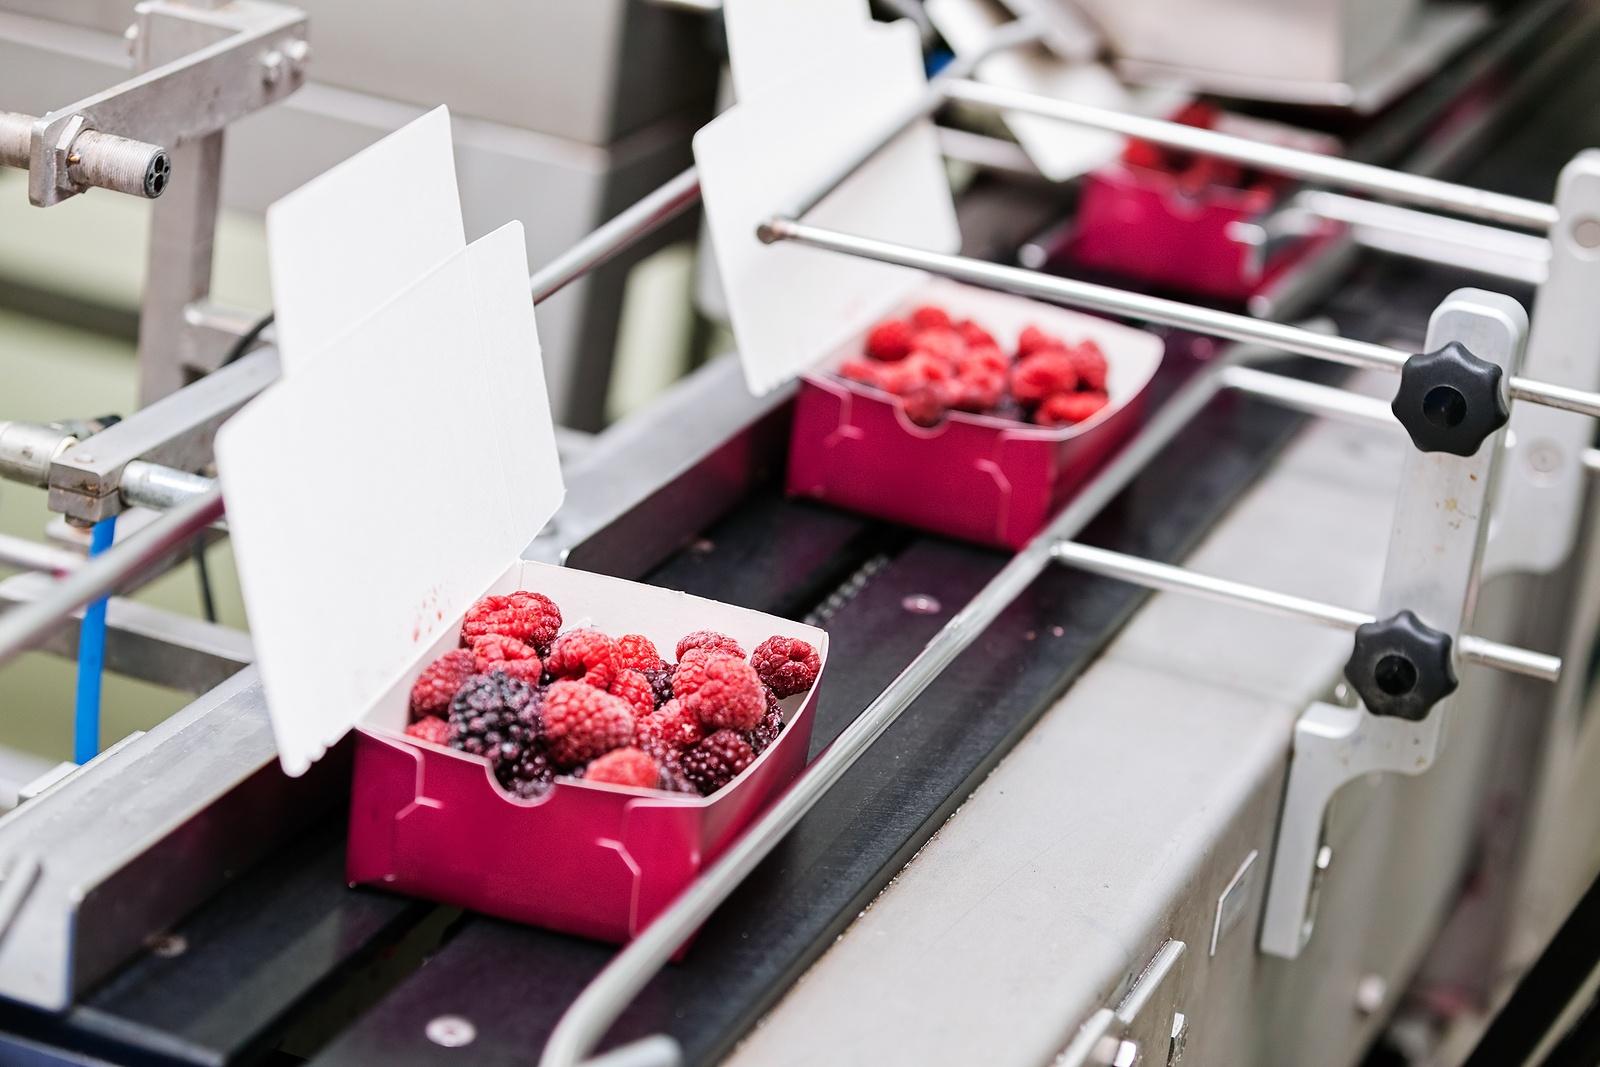 bigstock-Frozen-Raspberry-Processing-Bu-78878078